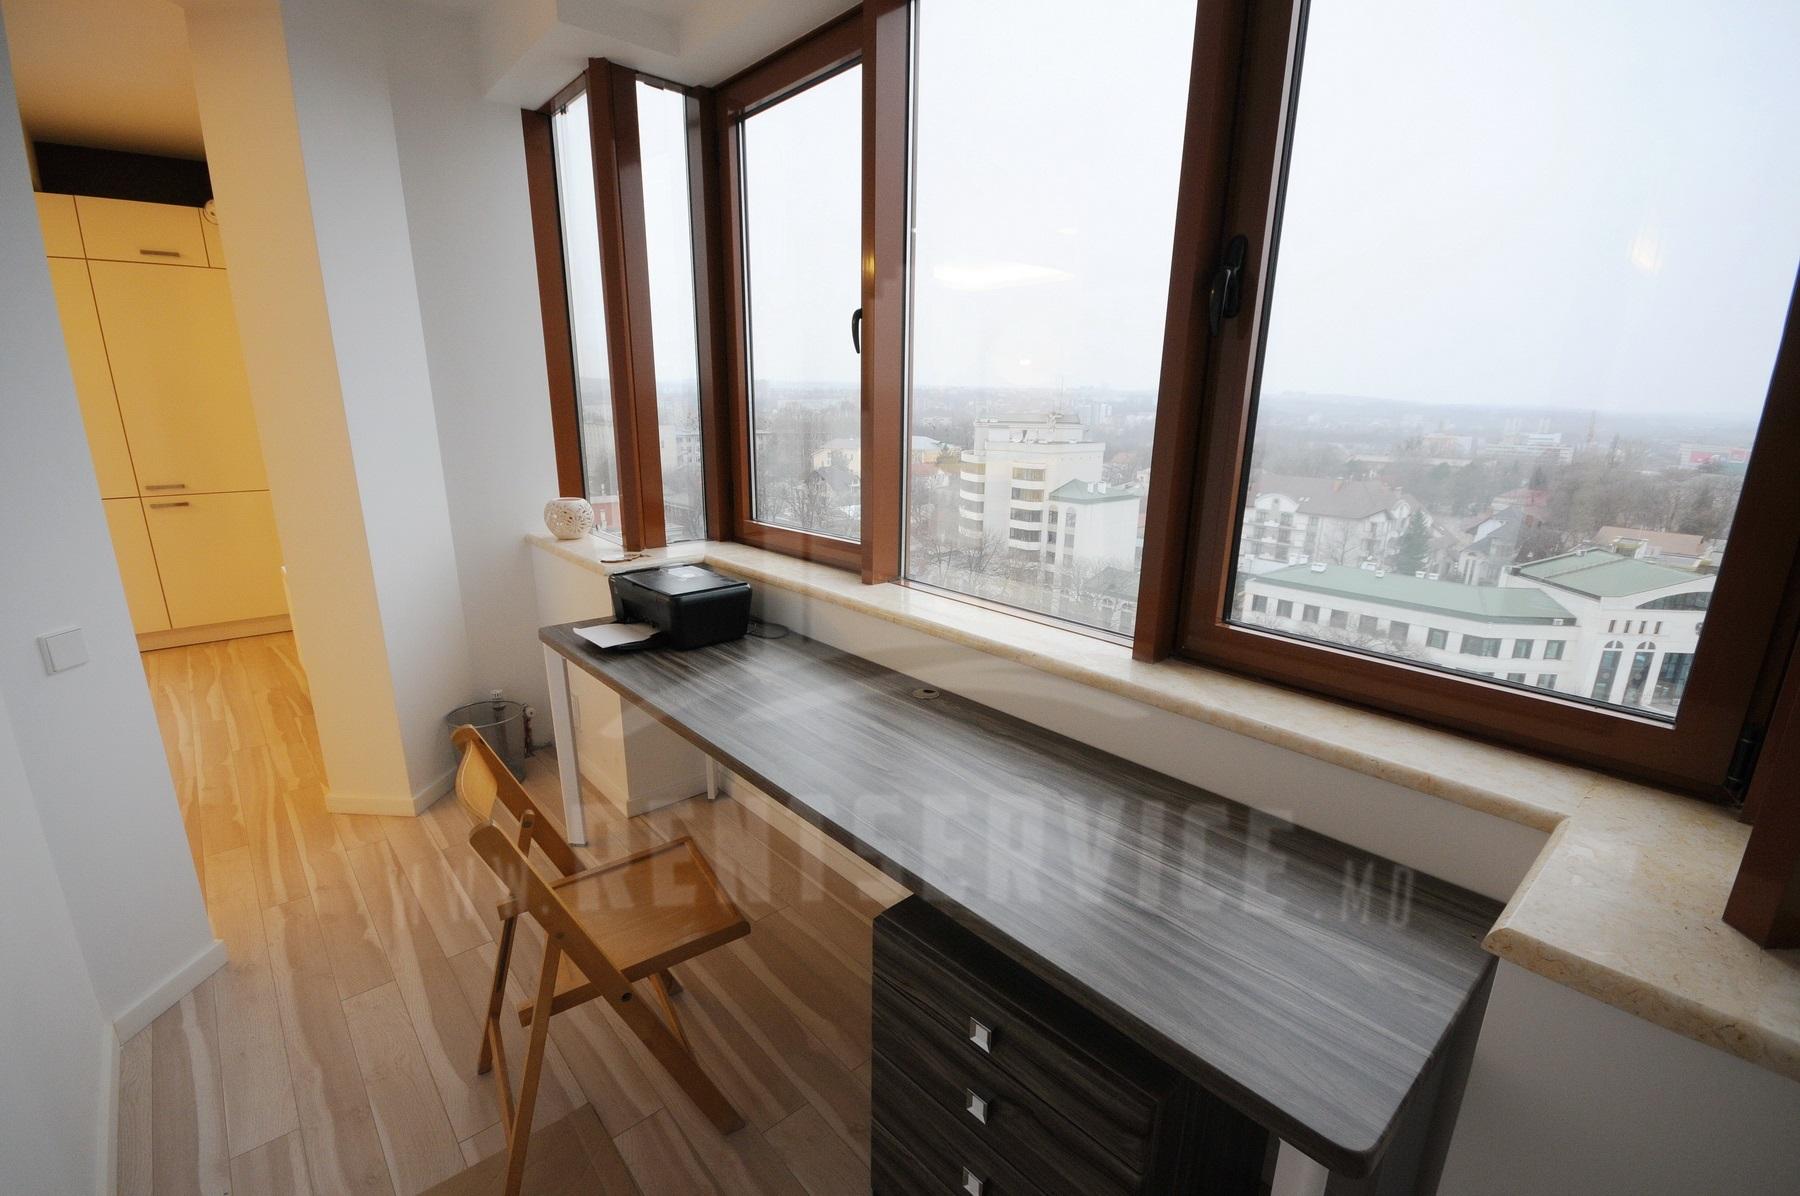 2060_apartment_8.JPG